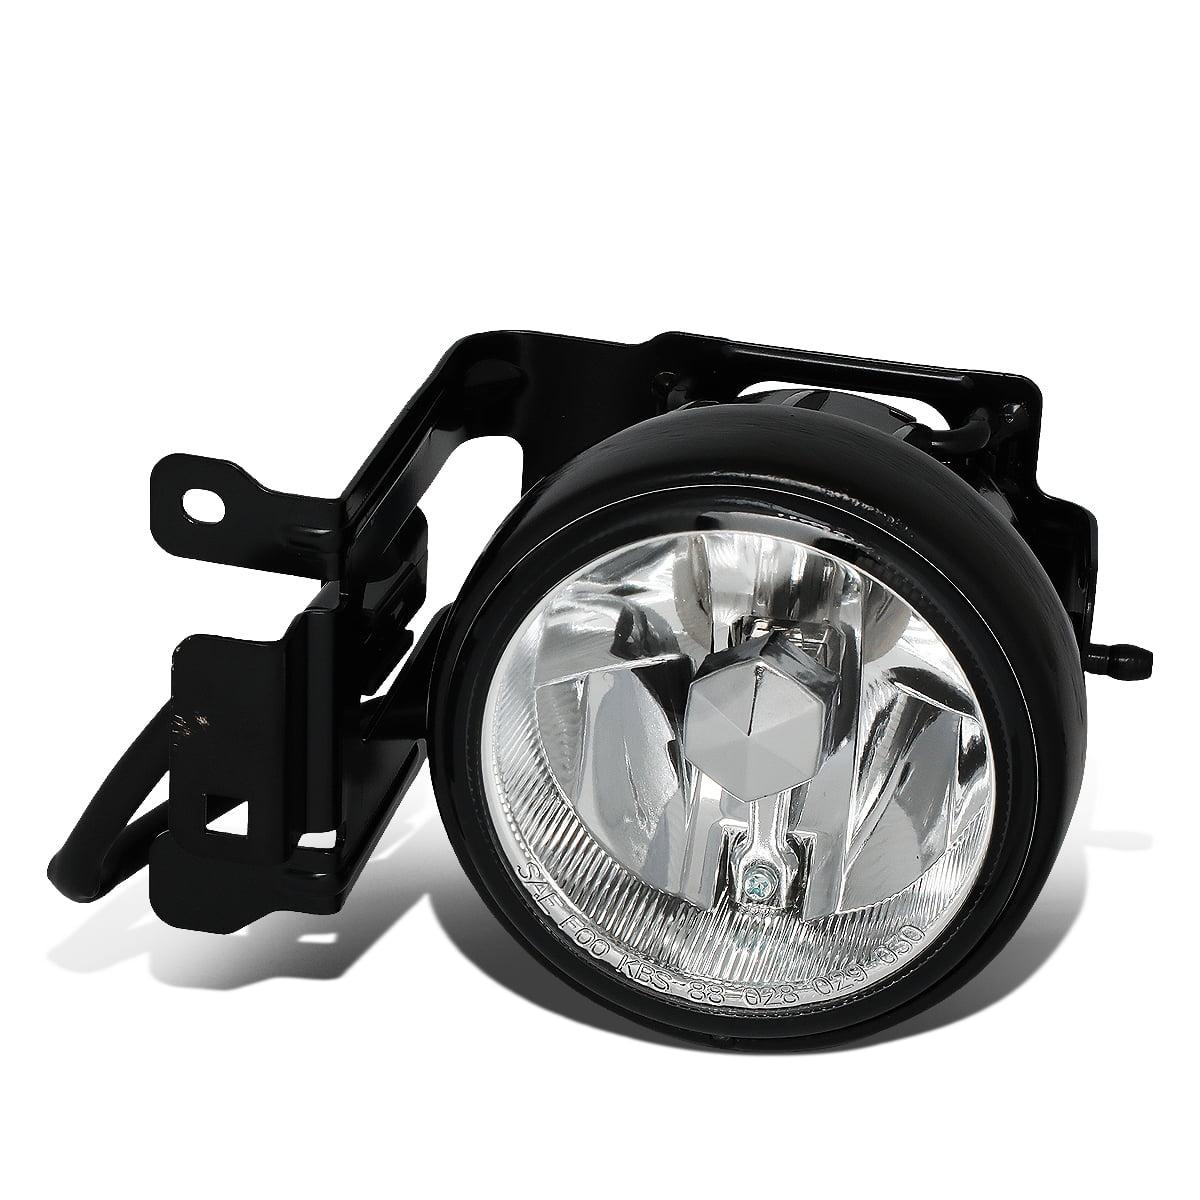 For 00-04 Mitsubishi Montero Sport Front Bumper Fog Light/Lamp Factory Style Left Side 01 02 03